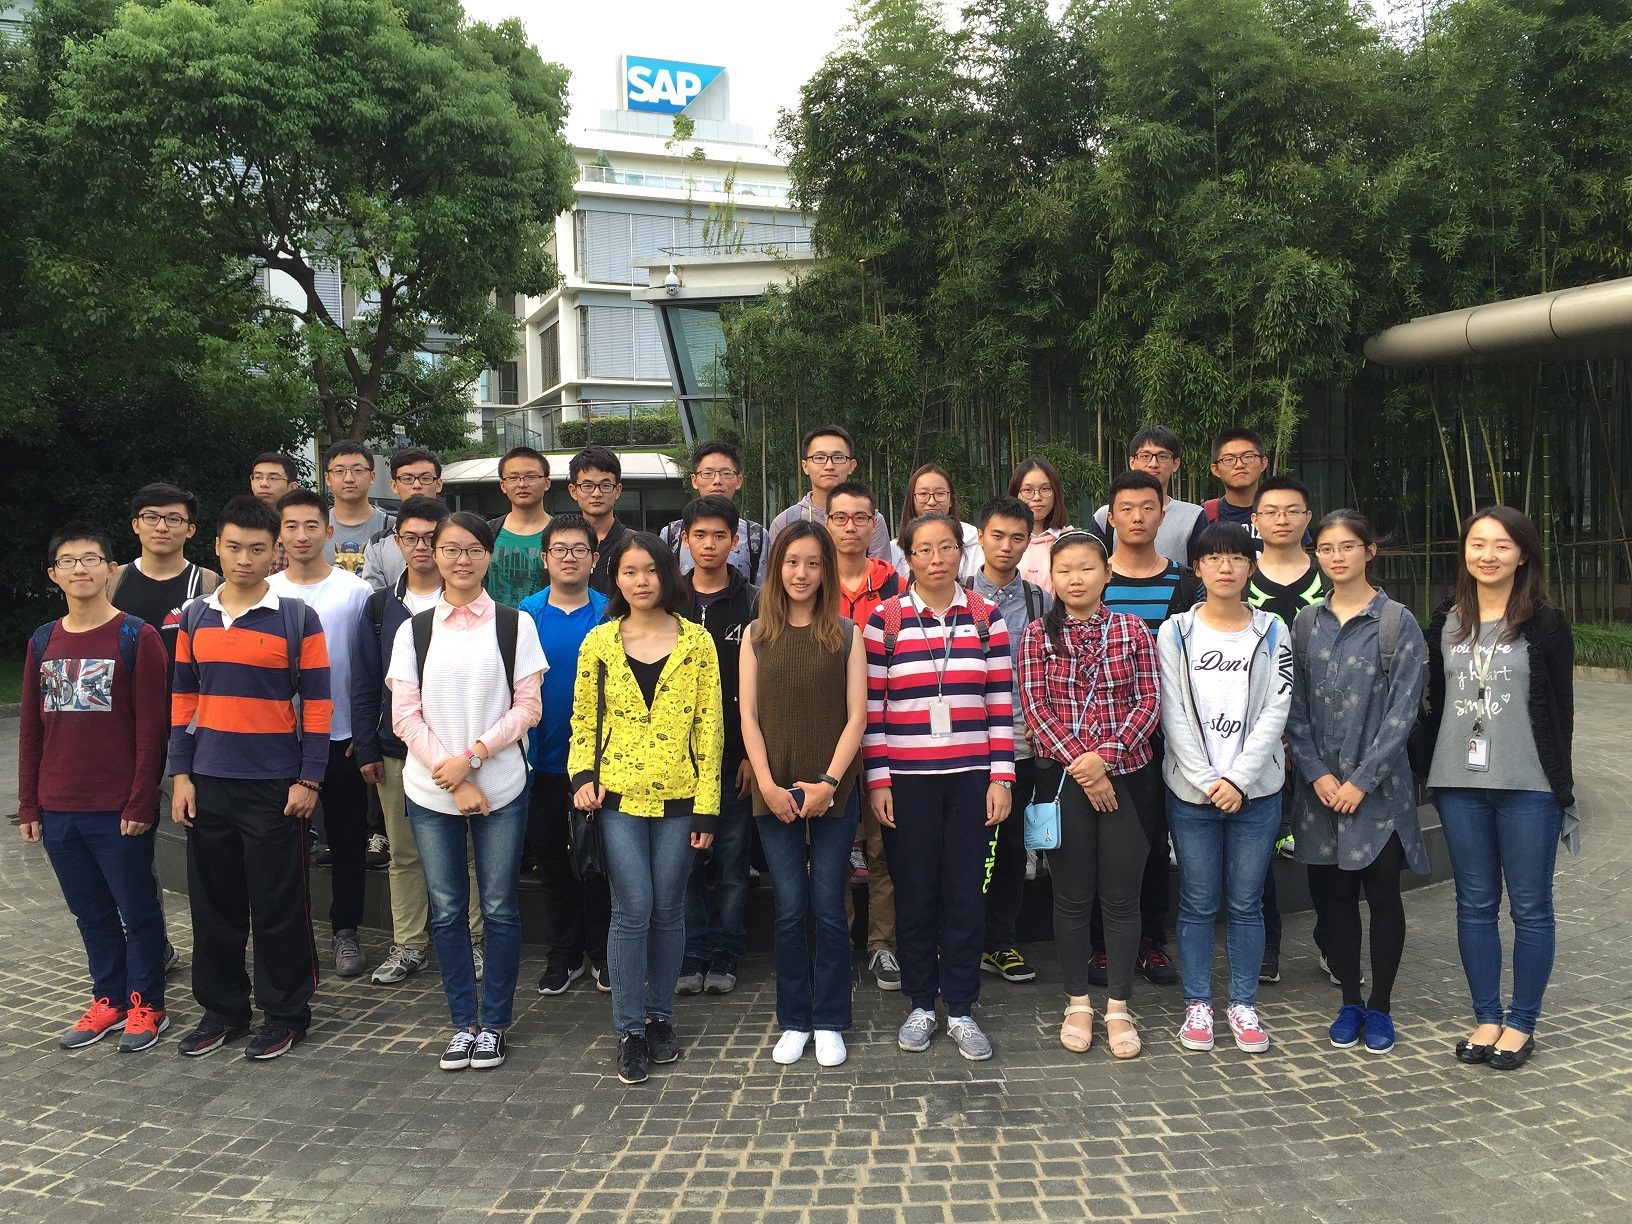 sap labs china_Open Day for Fudan University, 11 Oct 2016, Shanghai | SAP Blogs